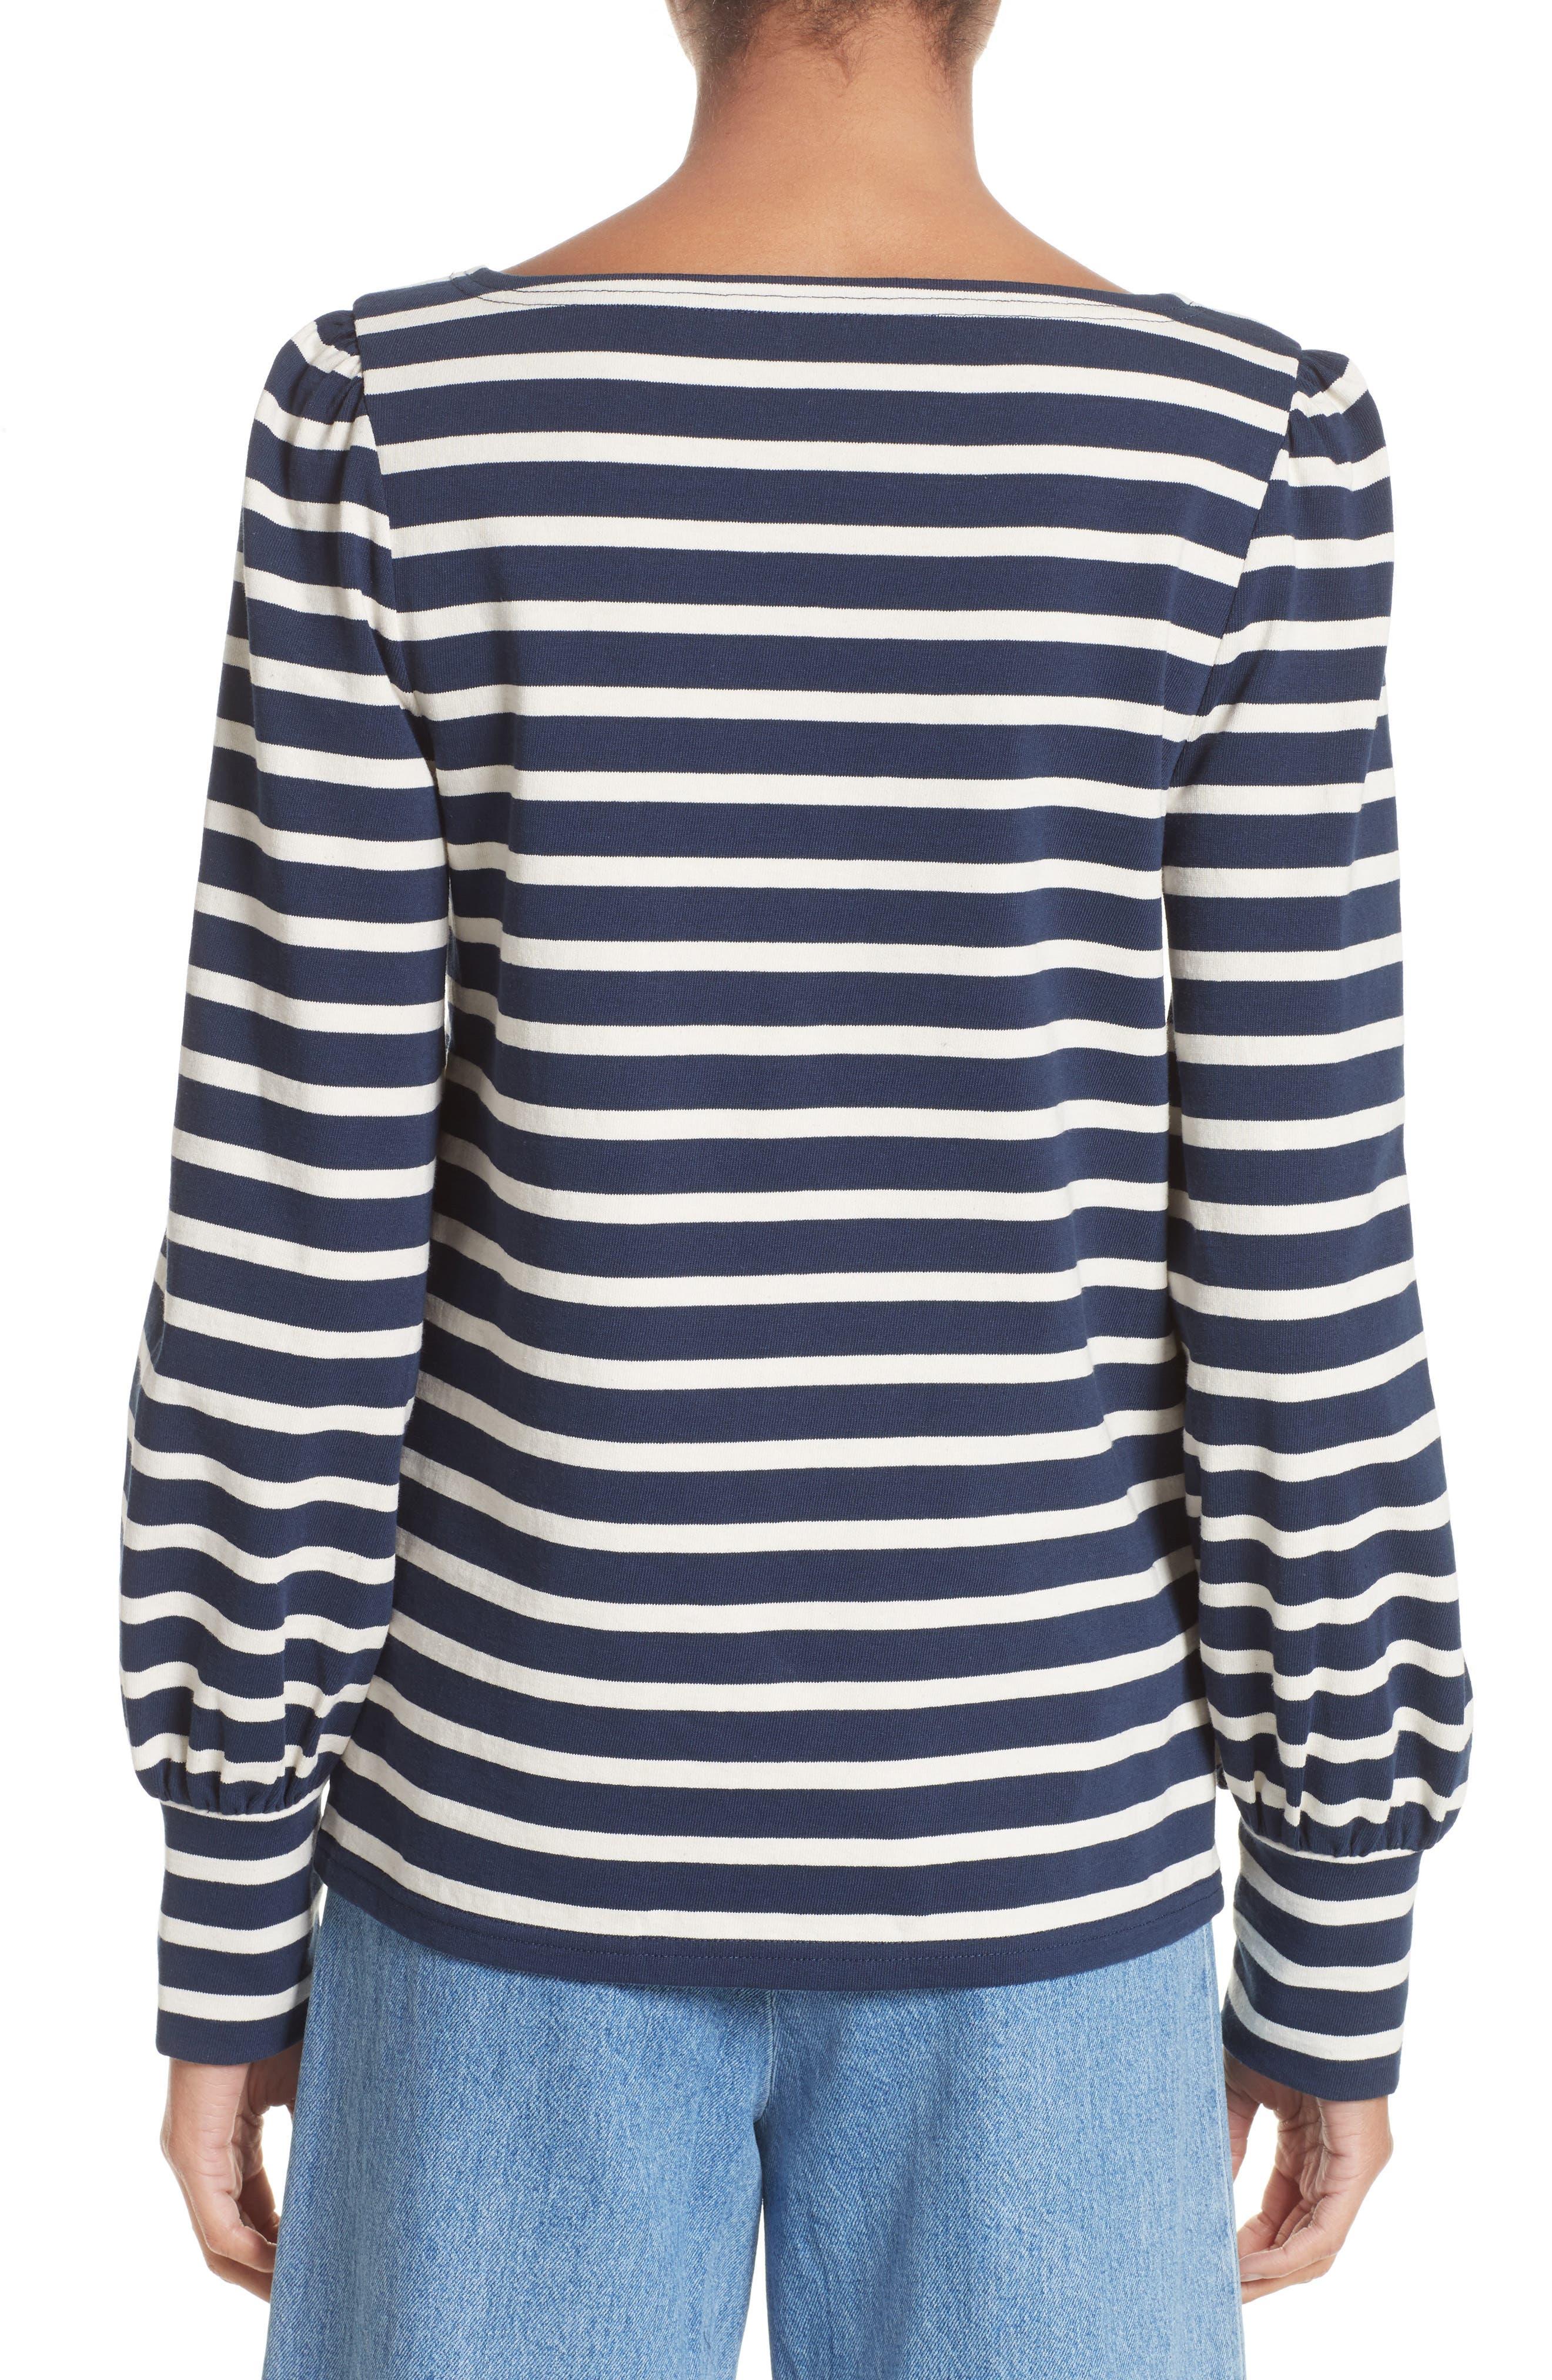 Alternate Image 2  - MARC JACOBS Reverse Breton Stripe Bell Sleeve Top